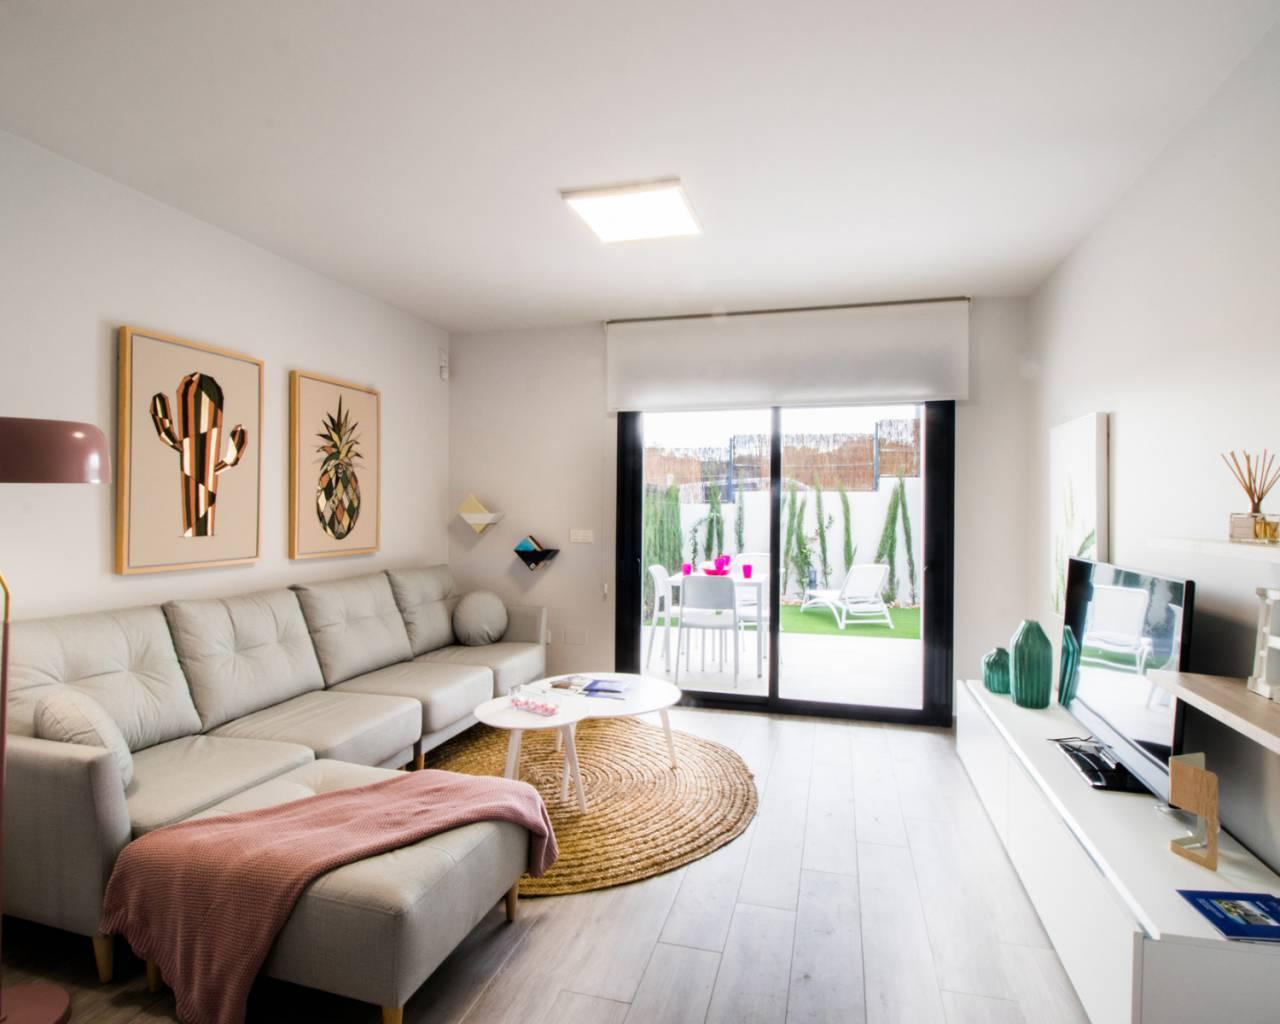 nieuwbouw-appartement-san-miguel-de-salinas_1787_xl